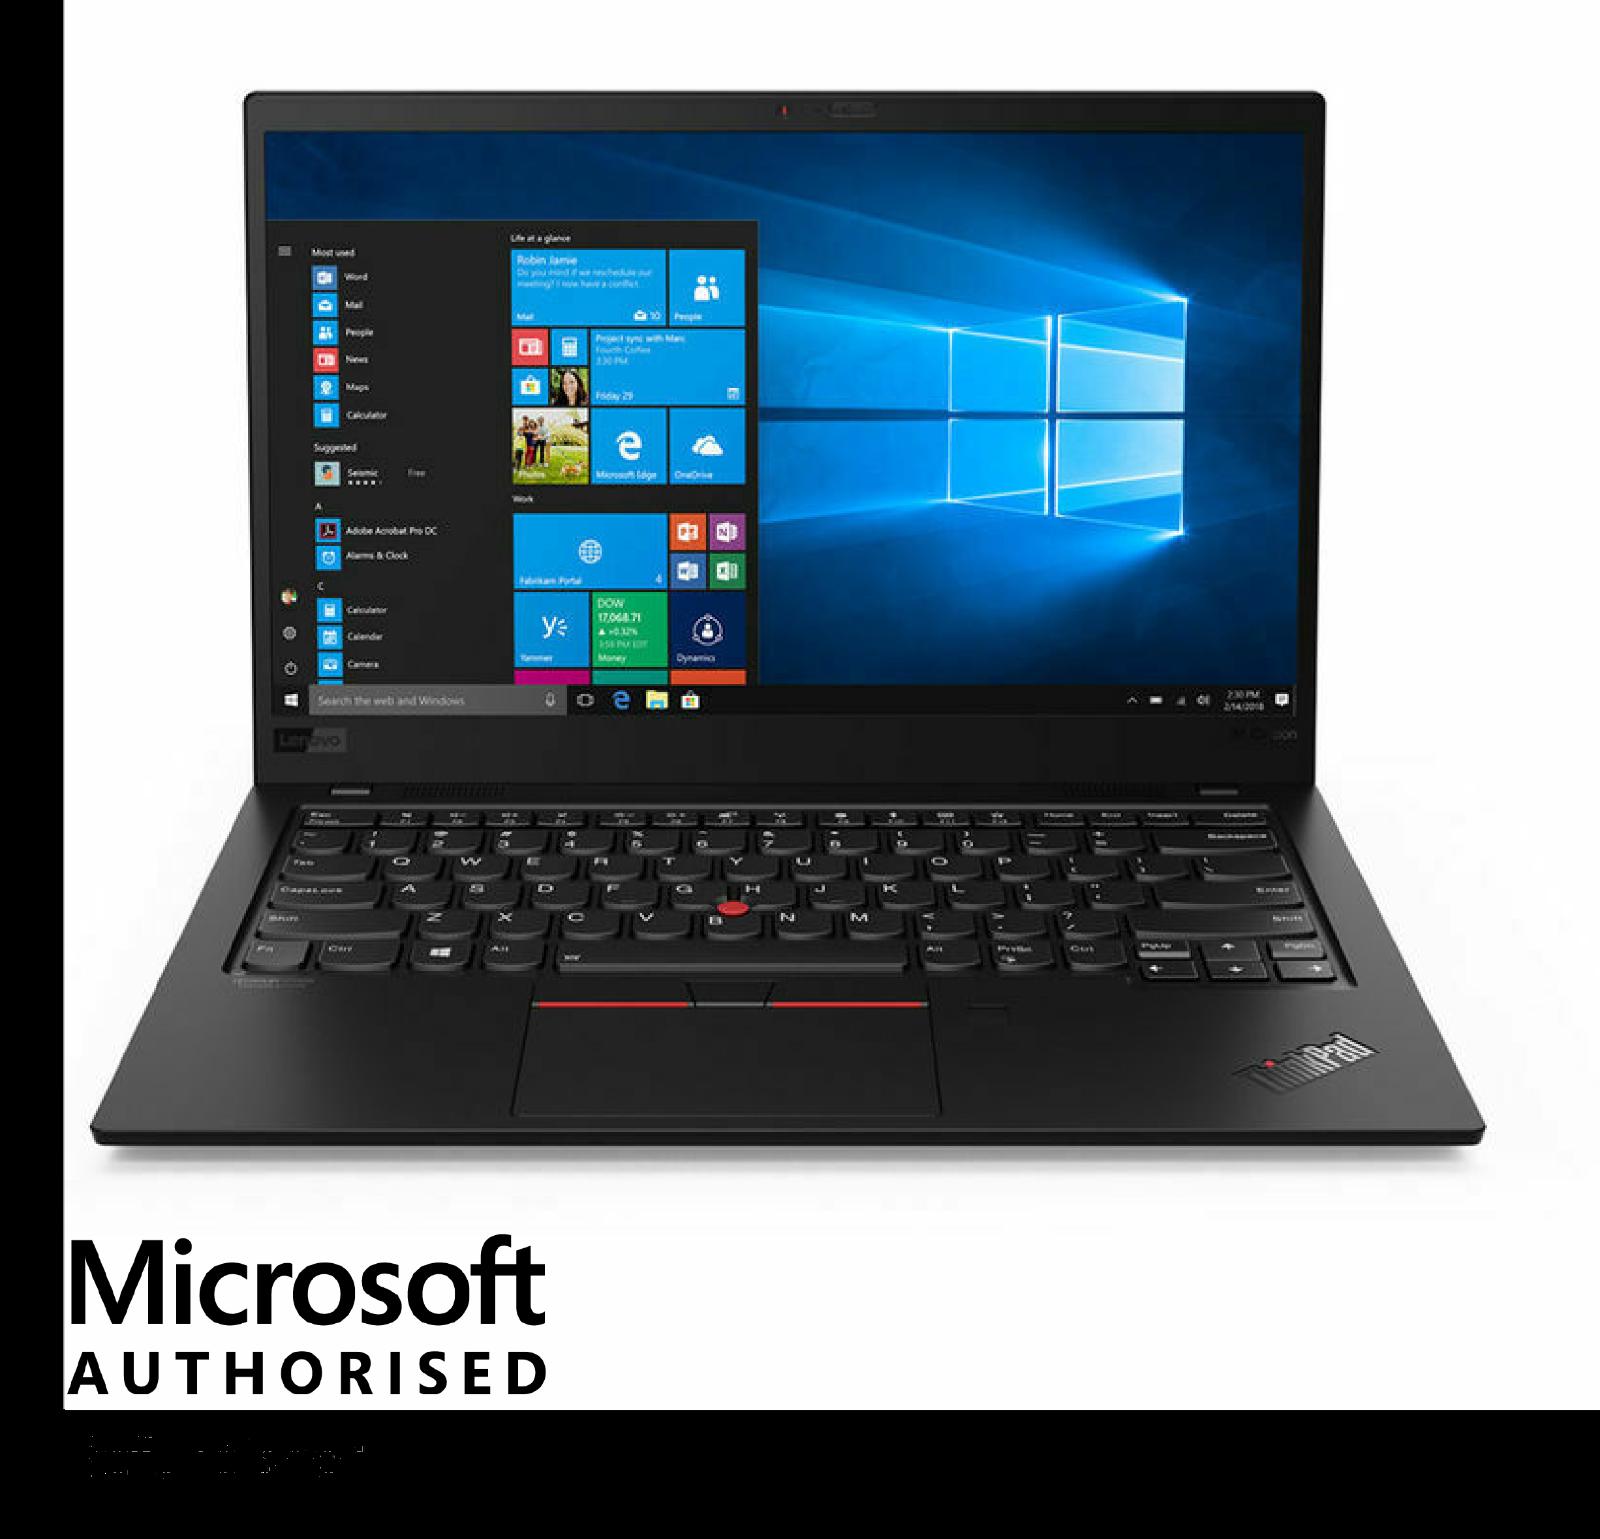 Laptop Windows - Lenovo ThinkPad X1 Carbon Ultrabook i7-5600U 256GB SSD 8GB RAM Windows 10 Pro